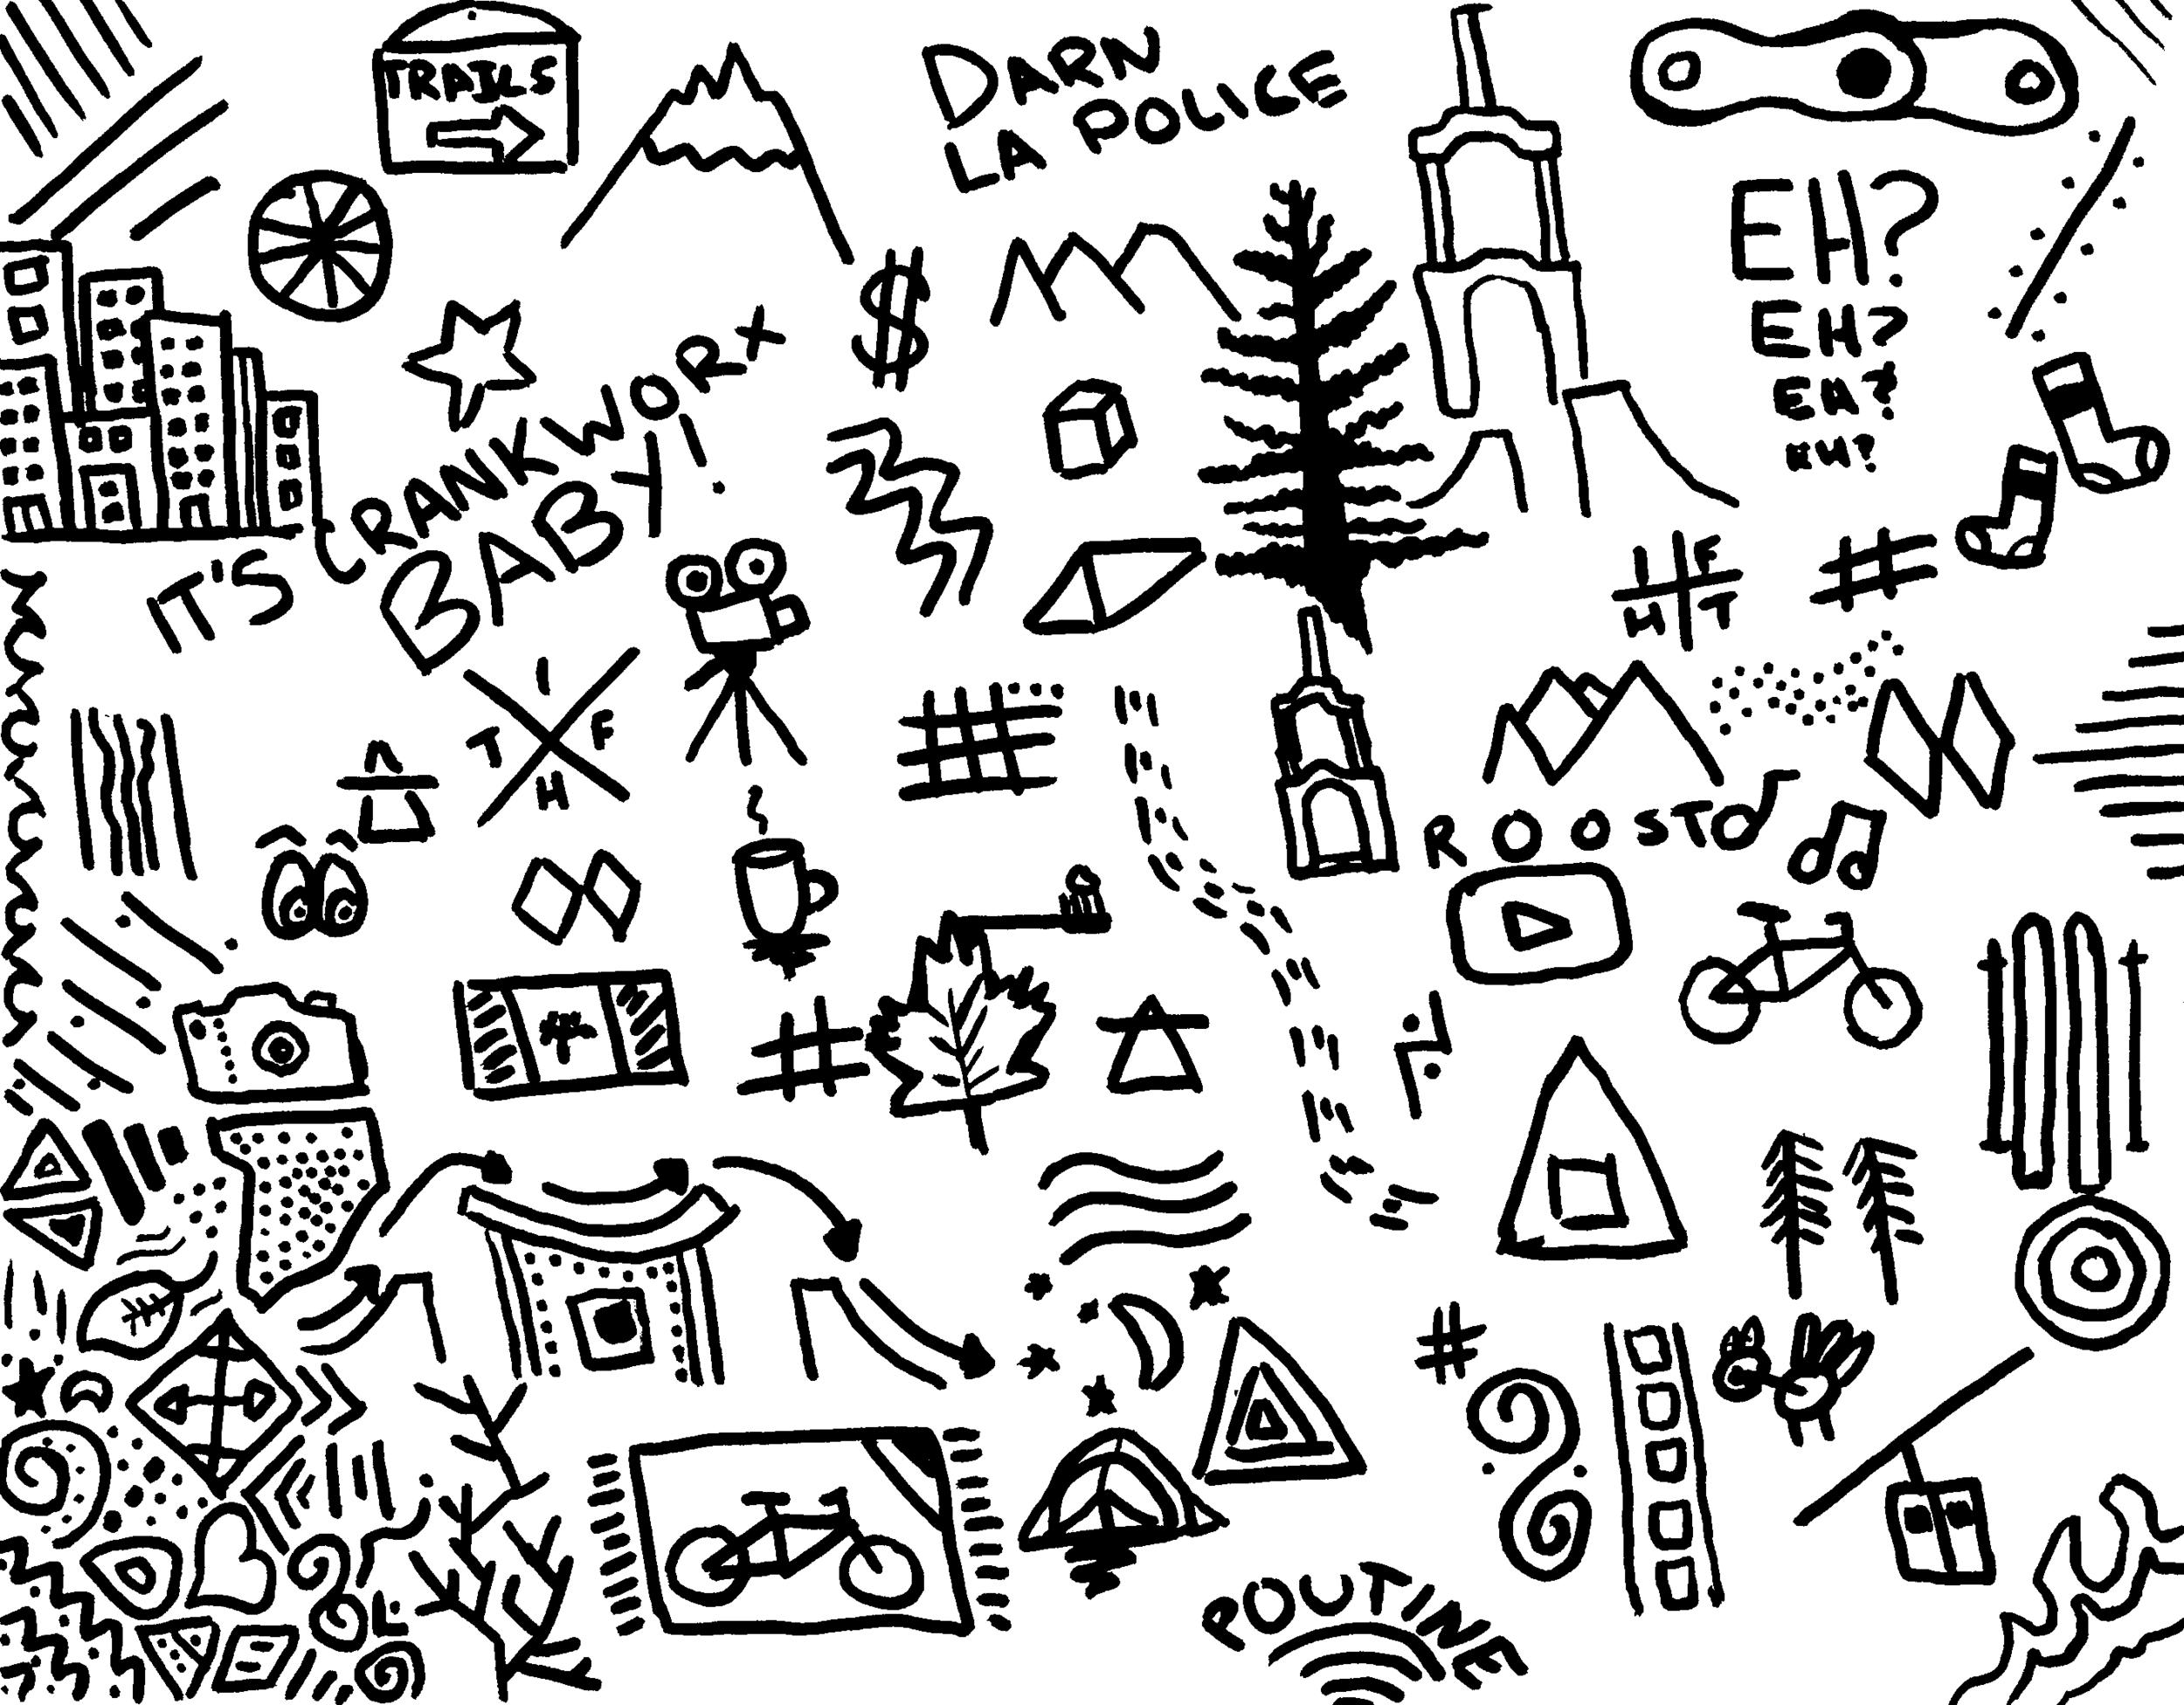 Jason Lucas'doodles.